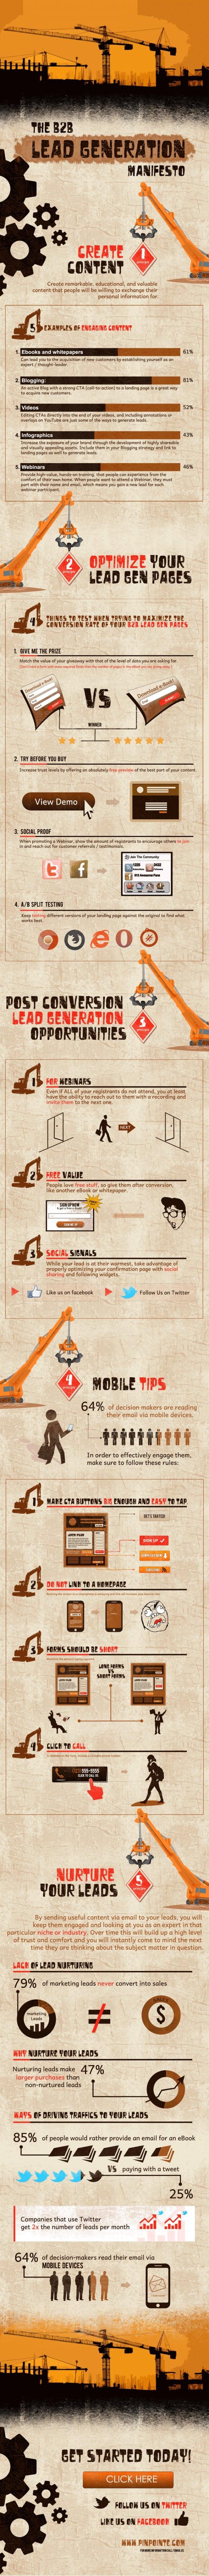 Infographic: The B2B Lead Generation Manifesto